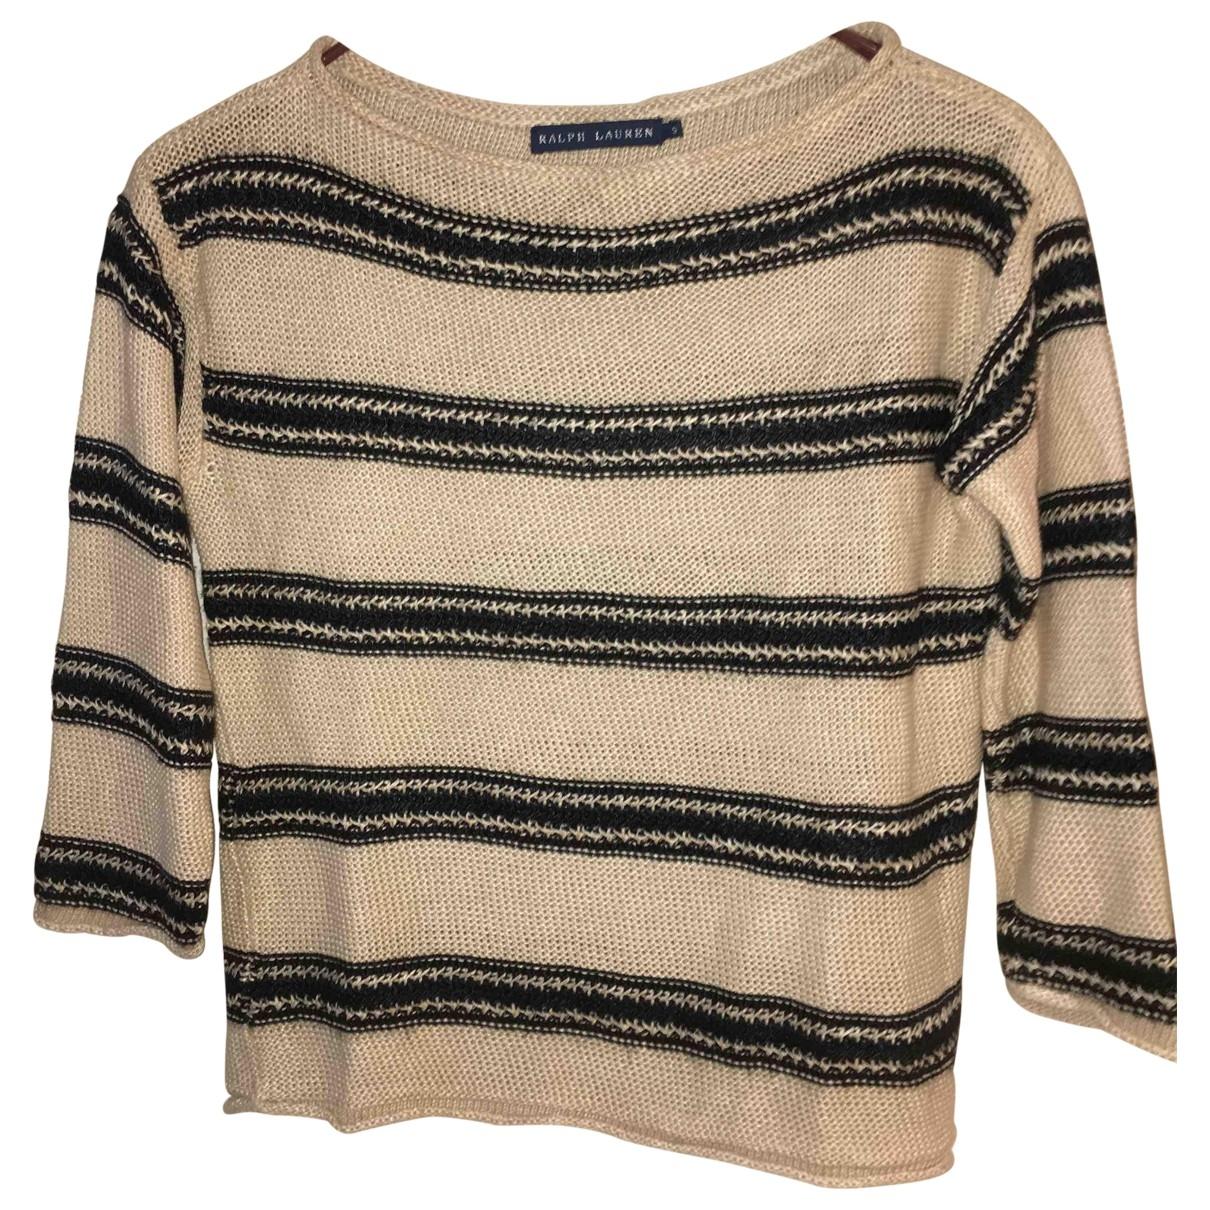 Ralph Lauren \N Pullover in  Ecru Seide